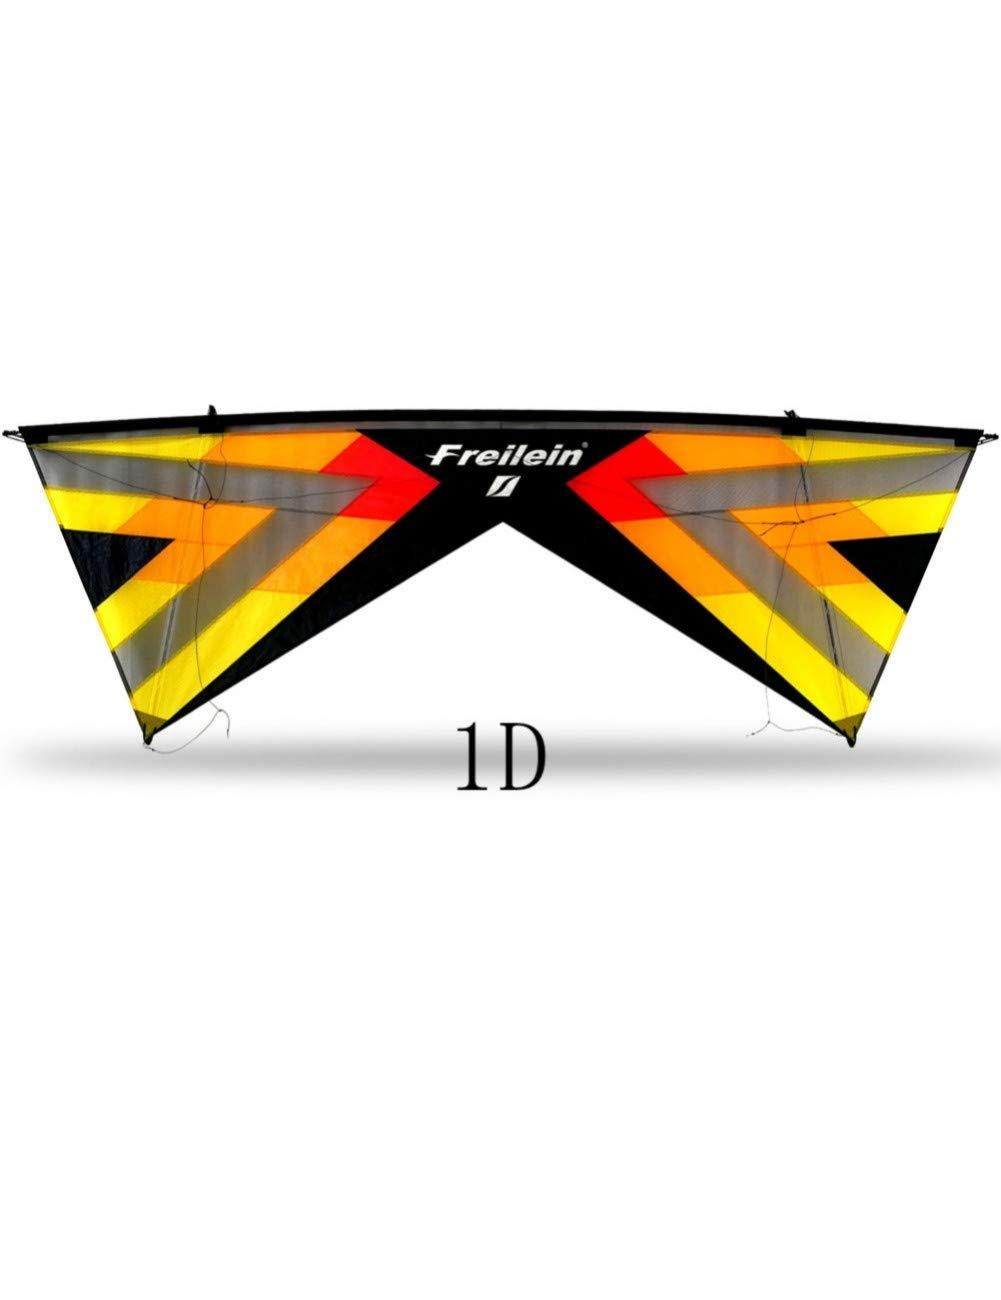 ZSYF Drachen Kite 2,42 M Quad Line Lenkdrachen Mit Handle Line Kite Bar Paragliding Leichtes Fliegen Beach Sport Kite Festival Show